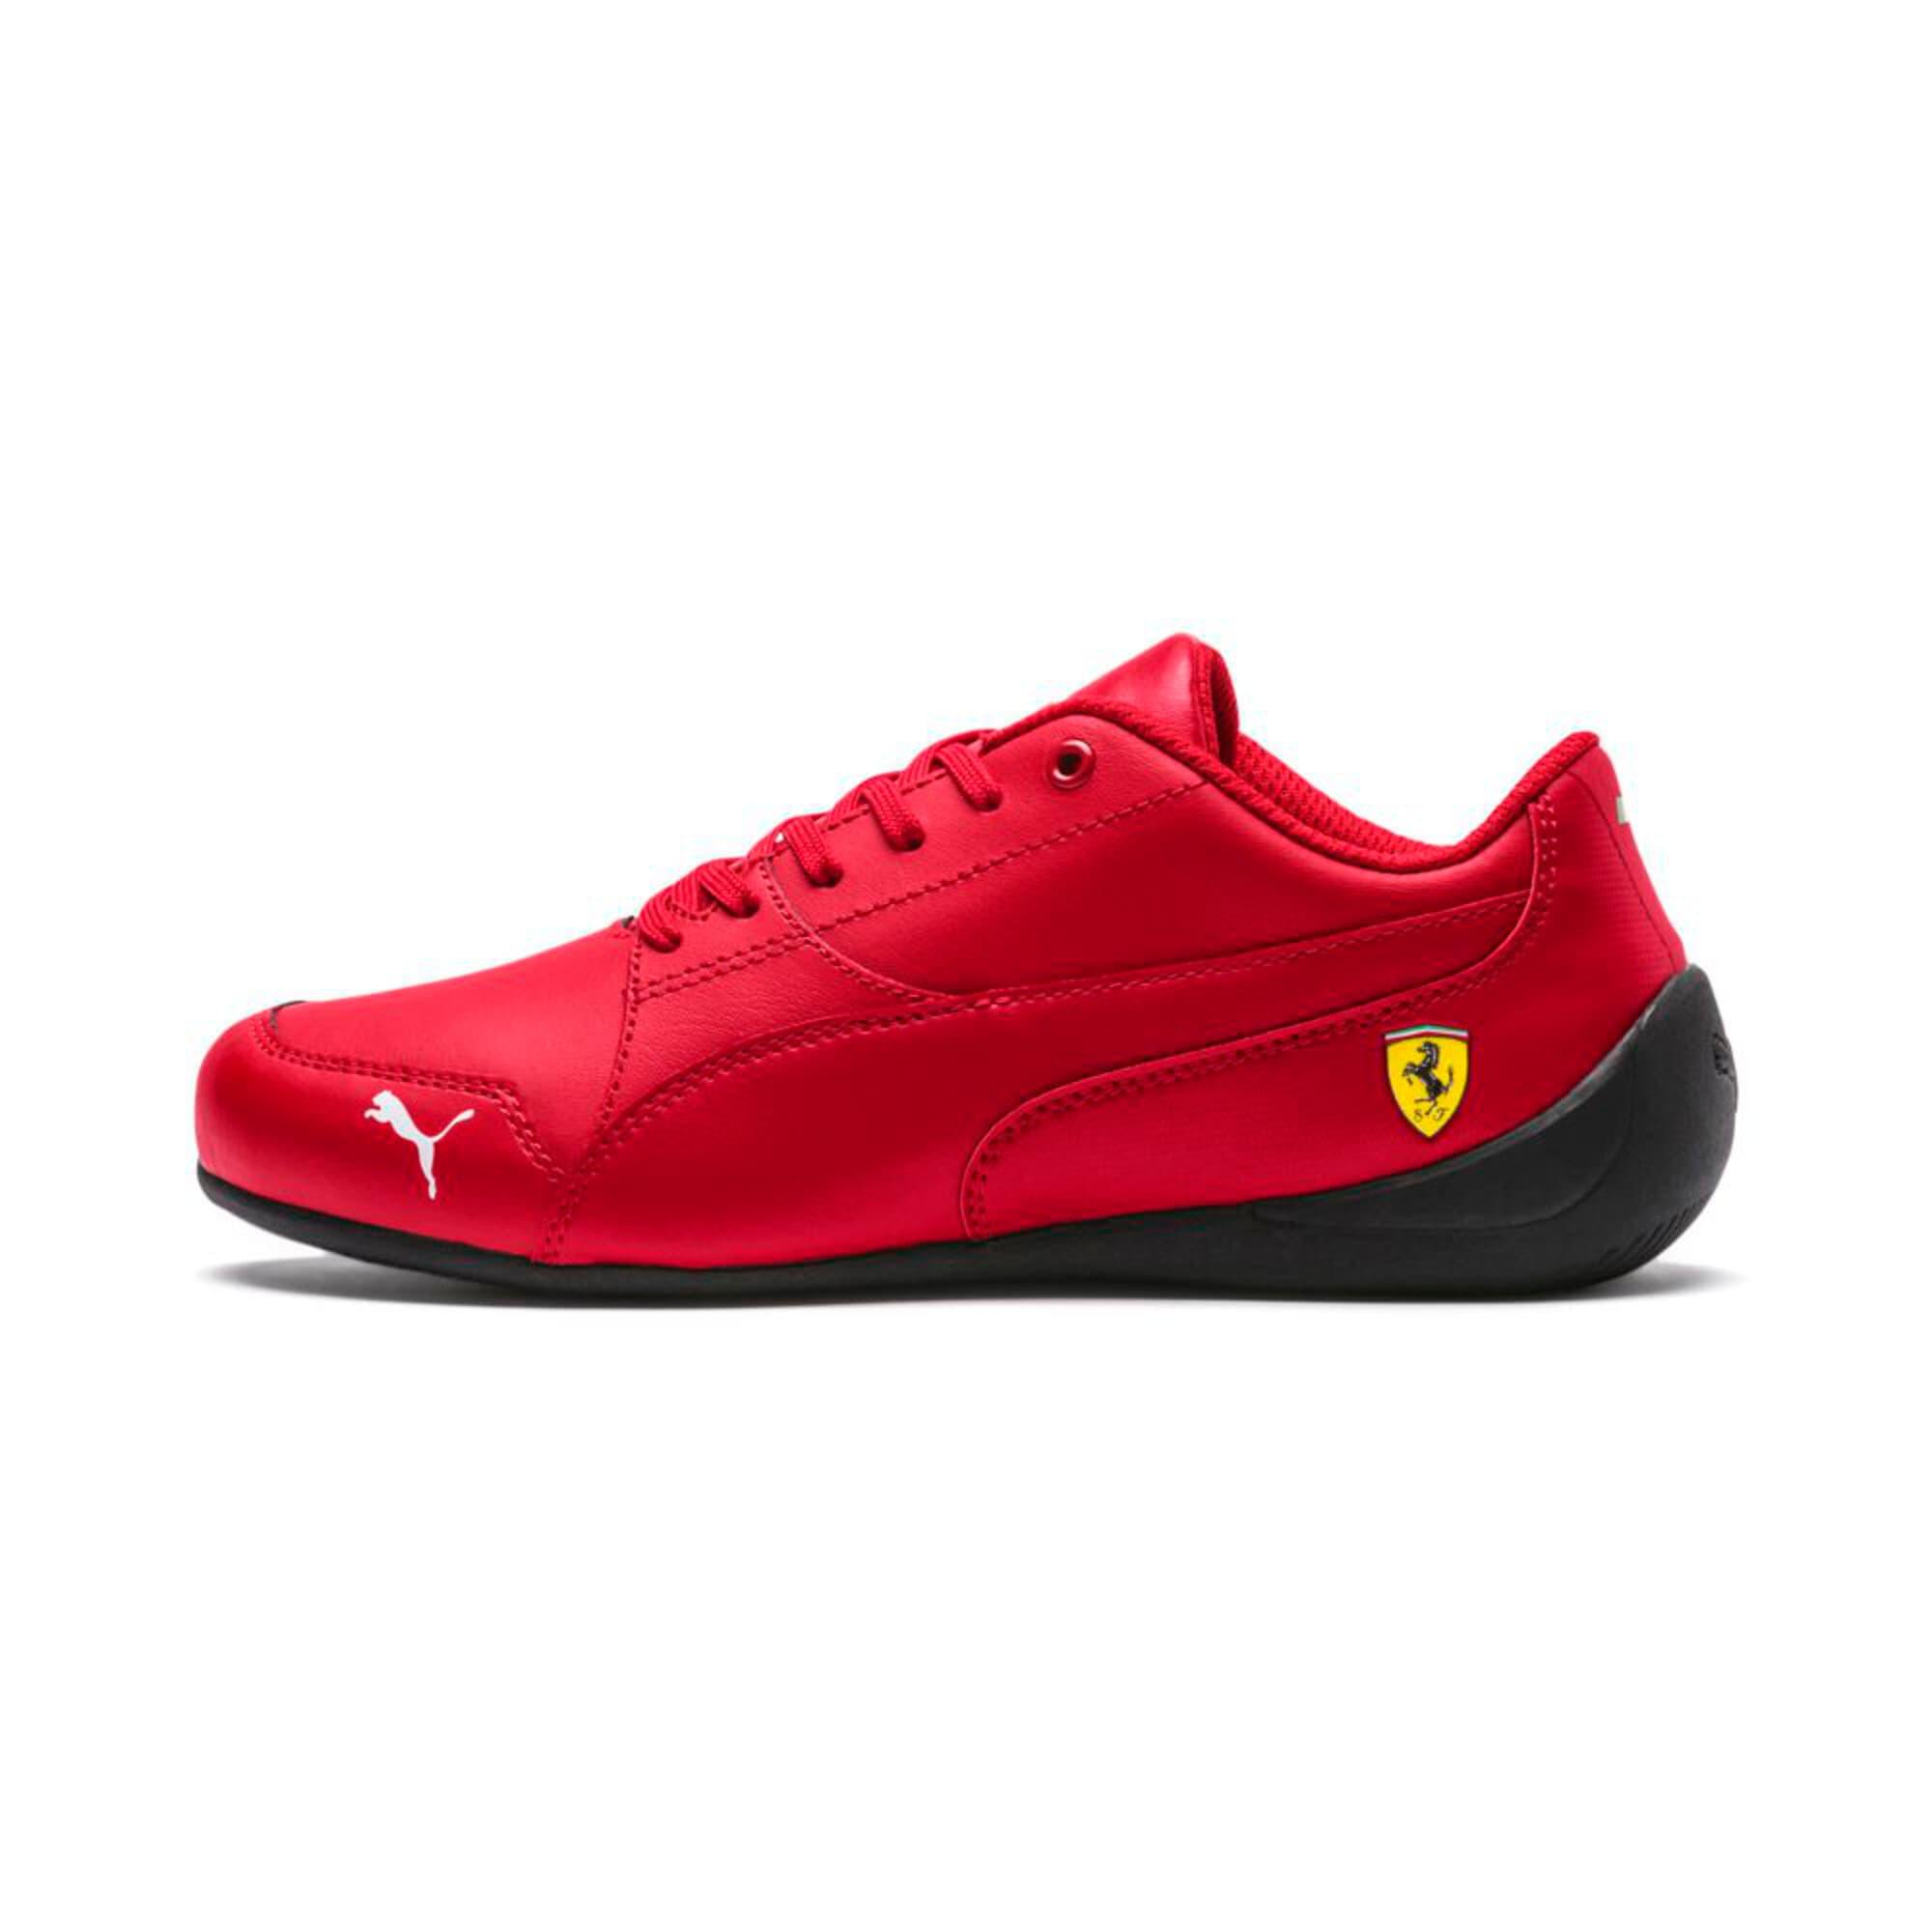 Thumbnail 1 of Ferrari Drift Cat 7 Kids' Trainers, Rosso Corsa-Rosso Corsa, medium-IND